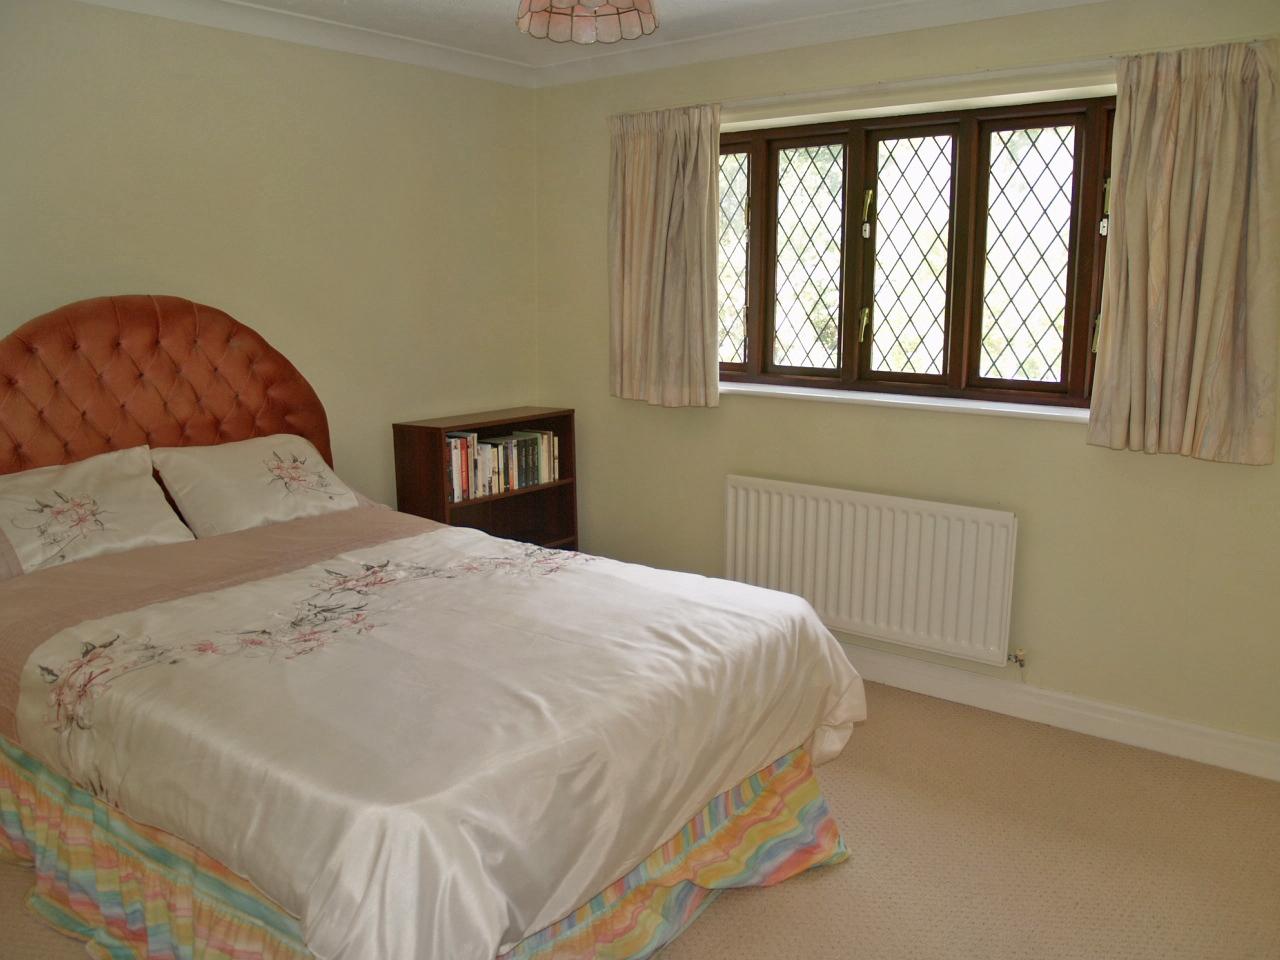 4 bedroom detached house SSTC in Birmingham - photograph 13.